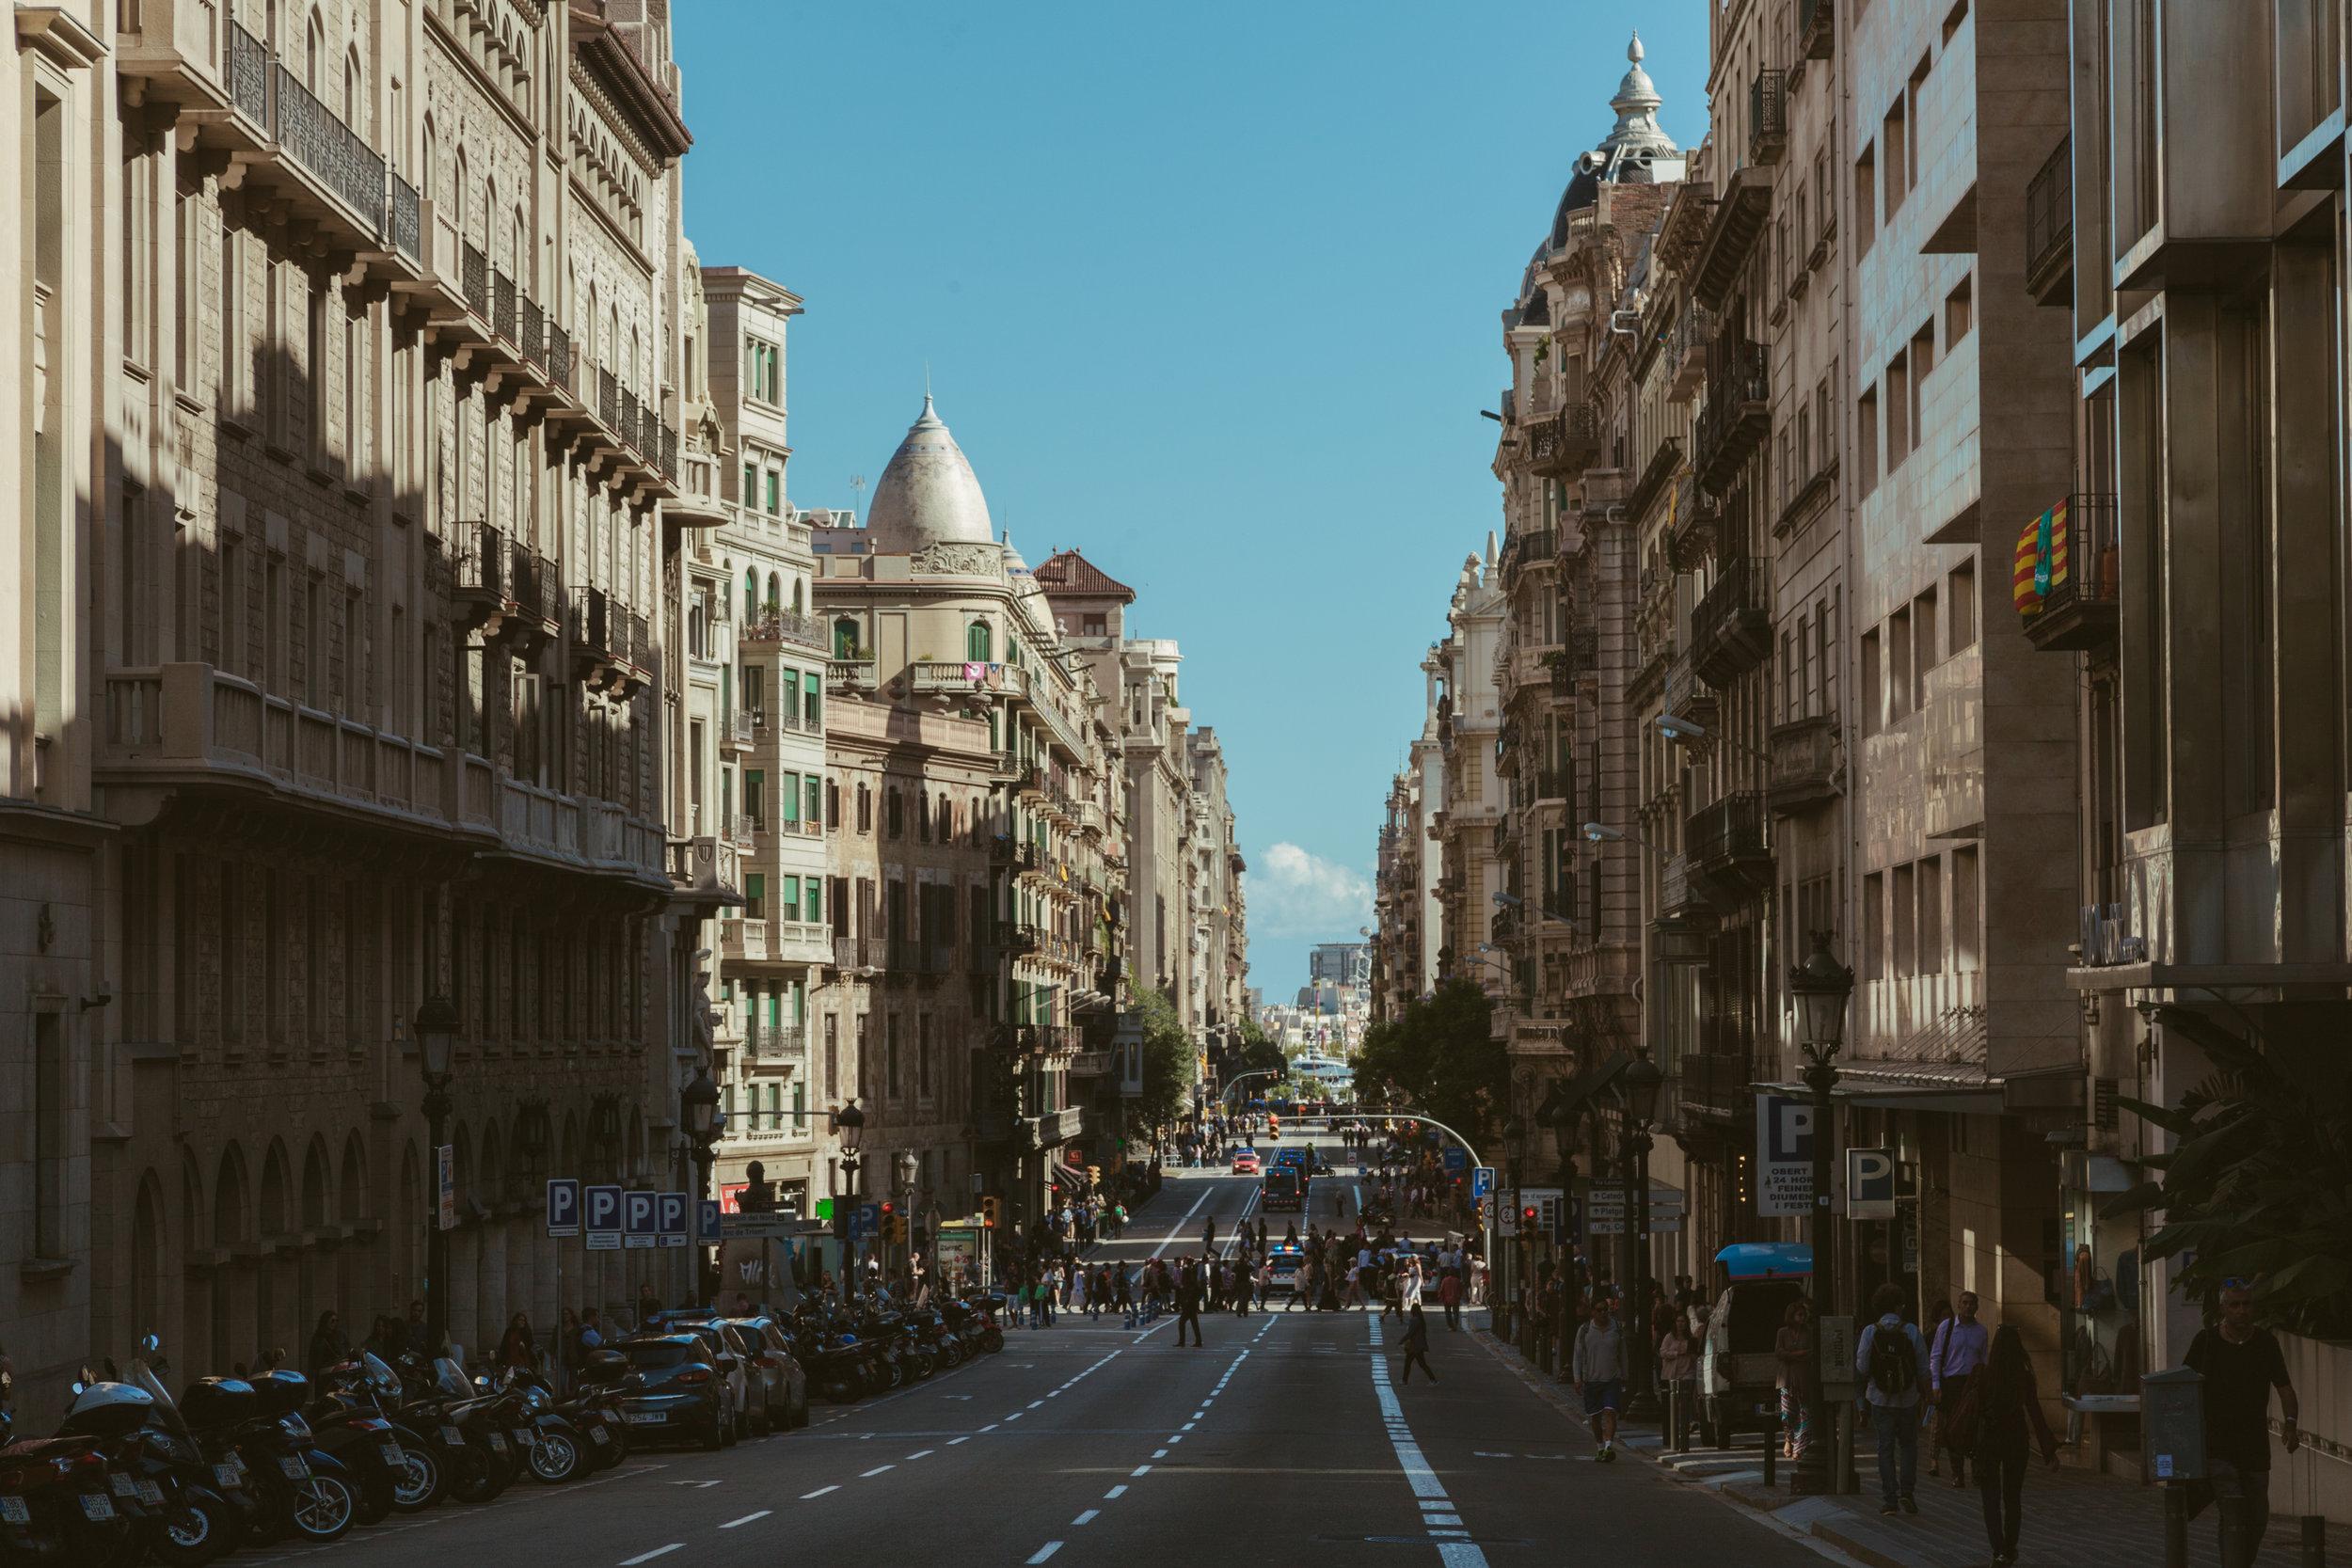 barcelonaweb-2.jpg